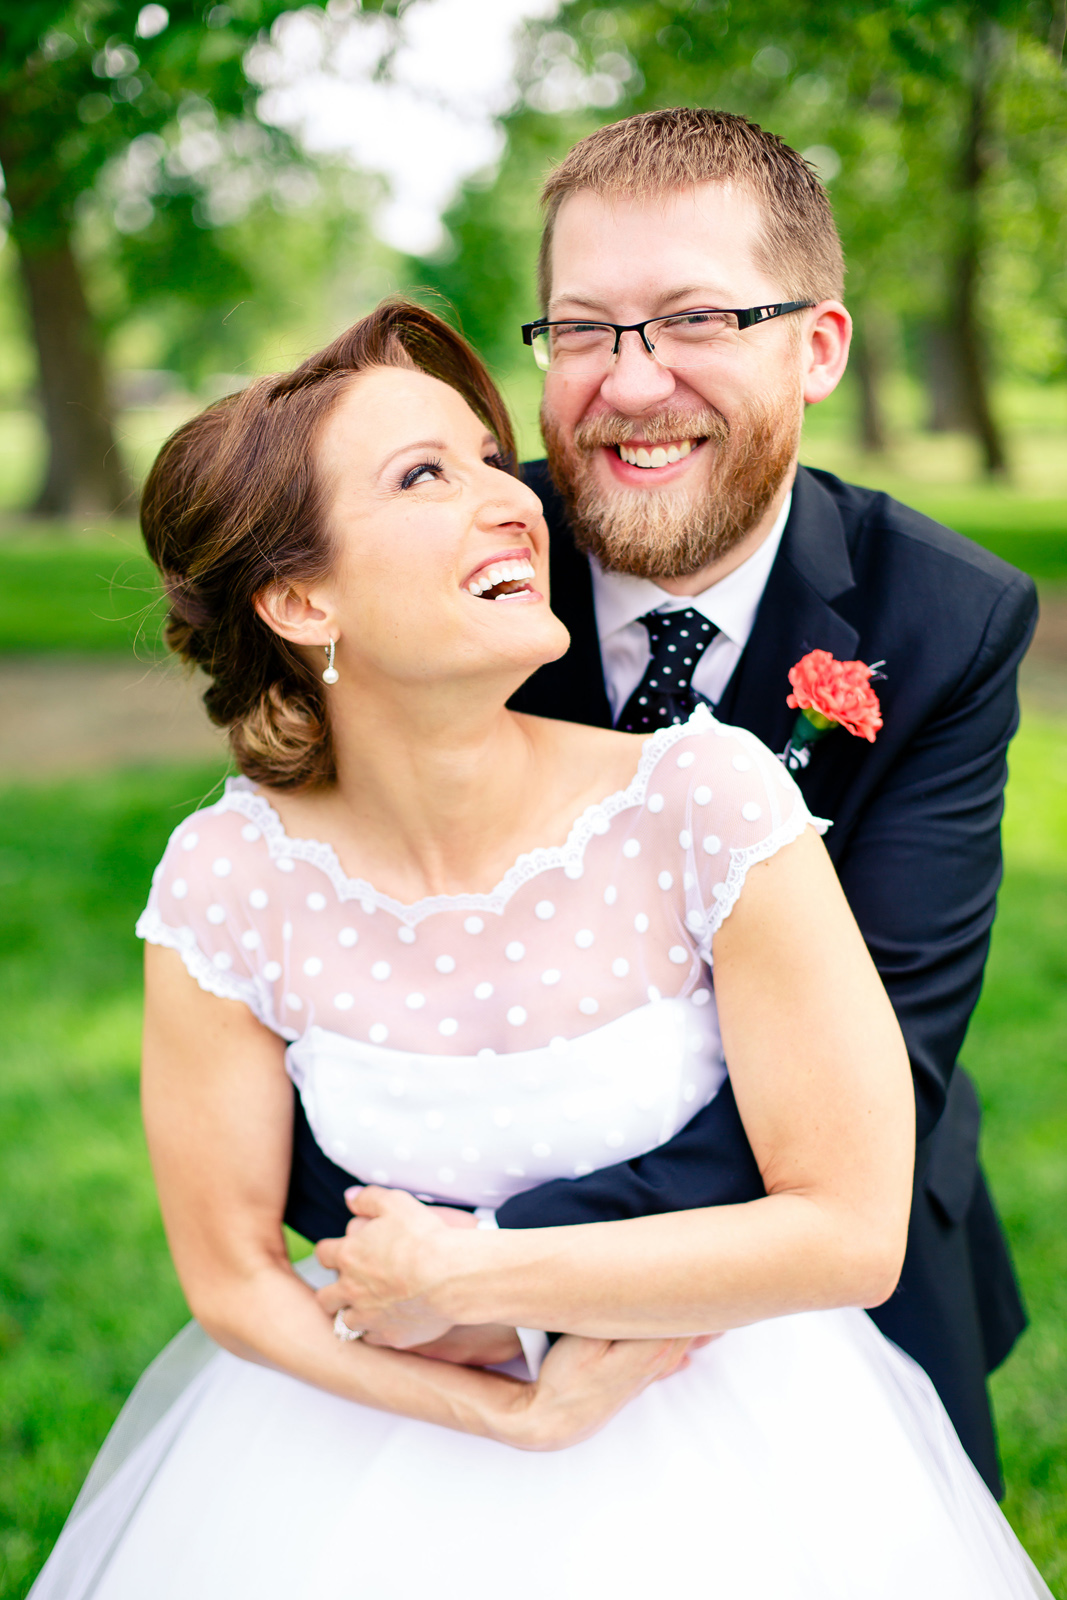 Wedding Day Photos in Forest Park - Bride with short wedding dress